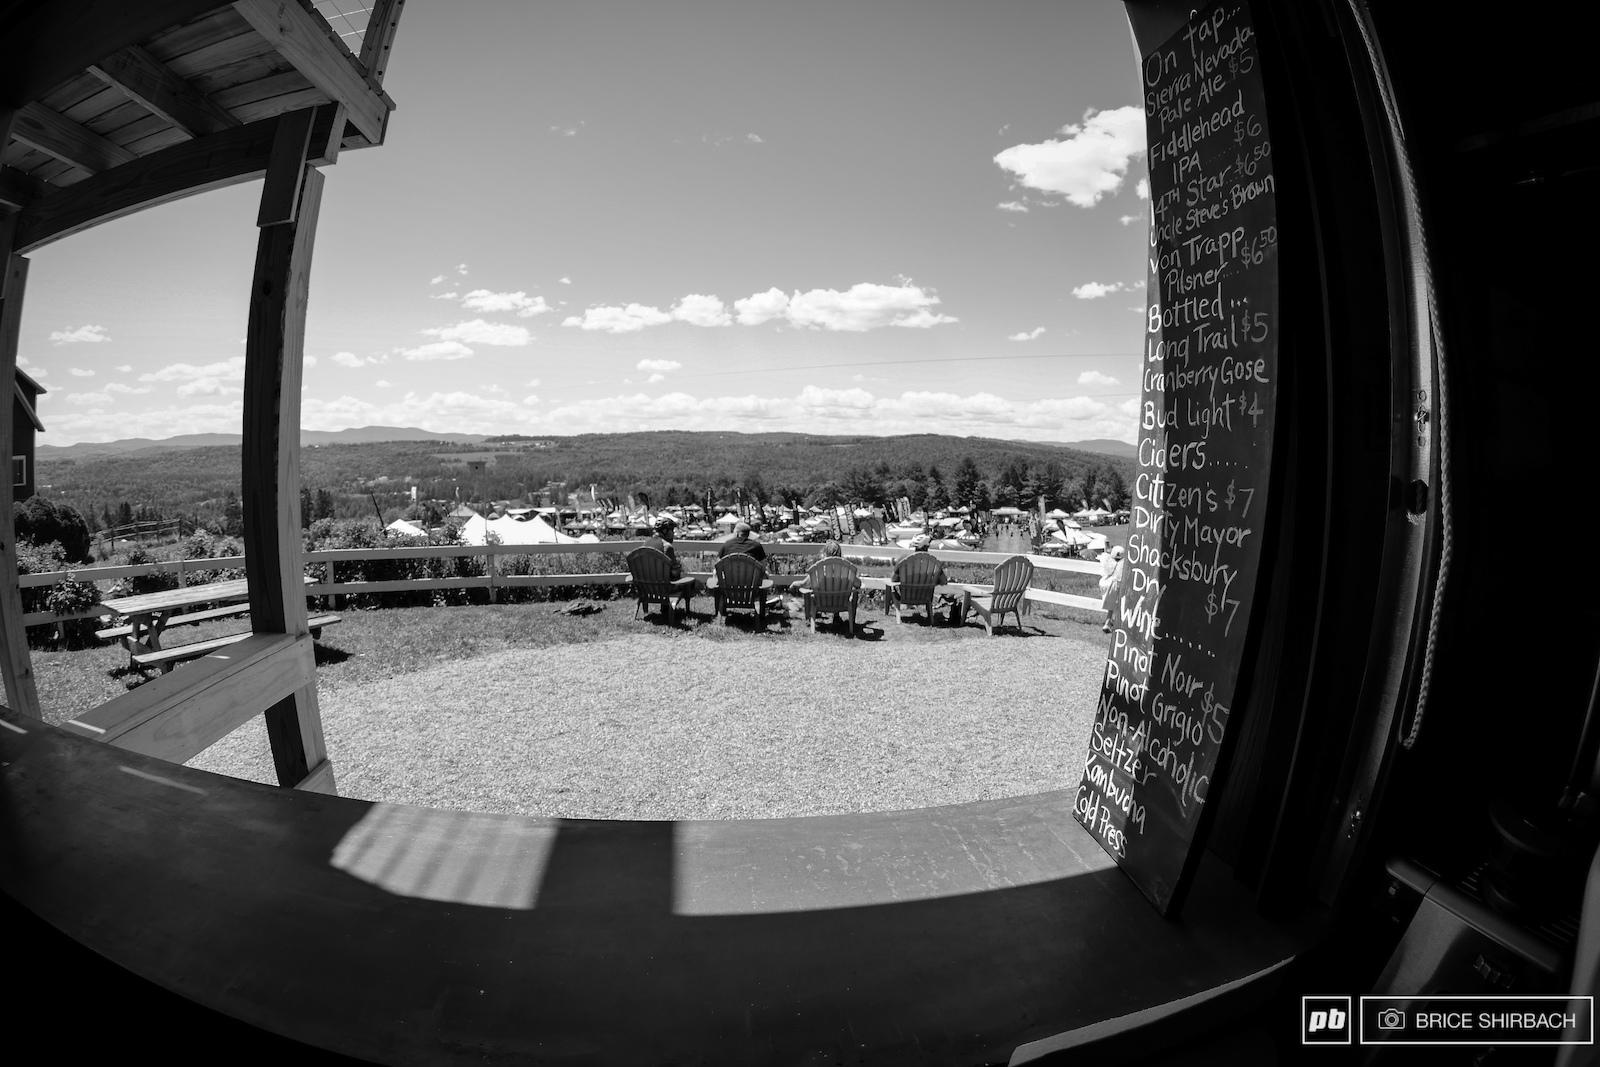 NEMBA Fest 2016